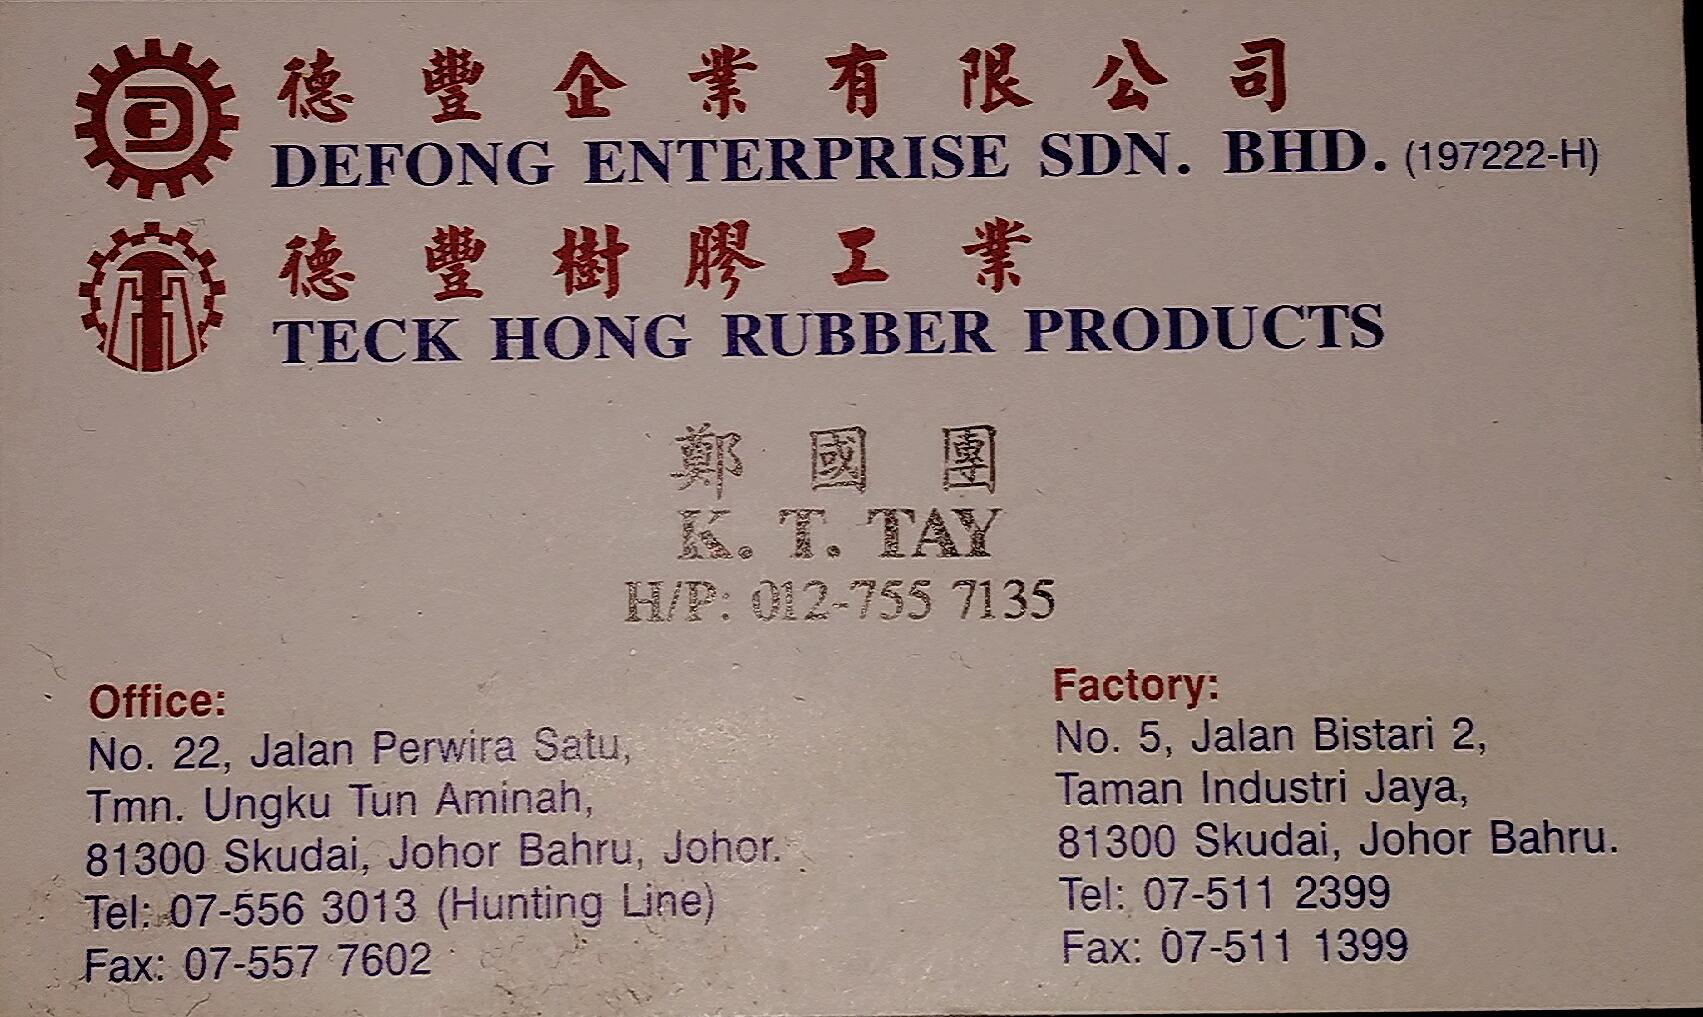 DeFong Enterprise Sdn Bhd (Johor)